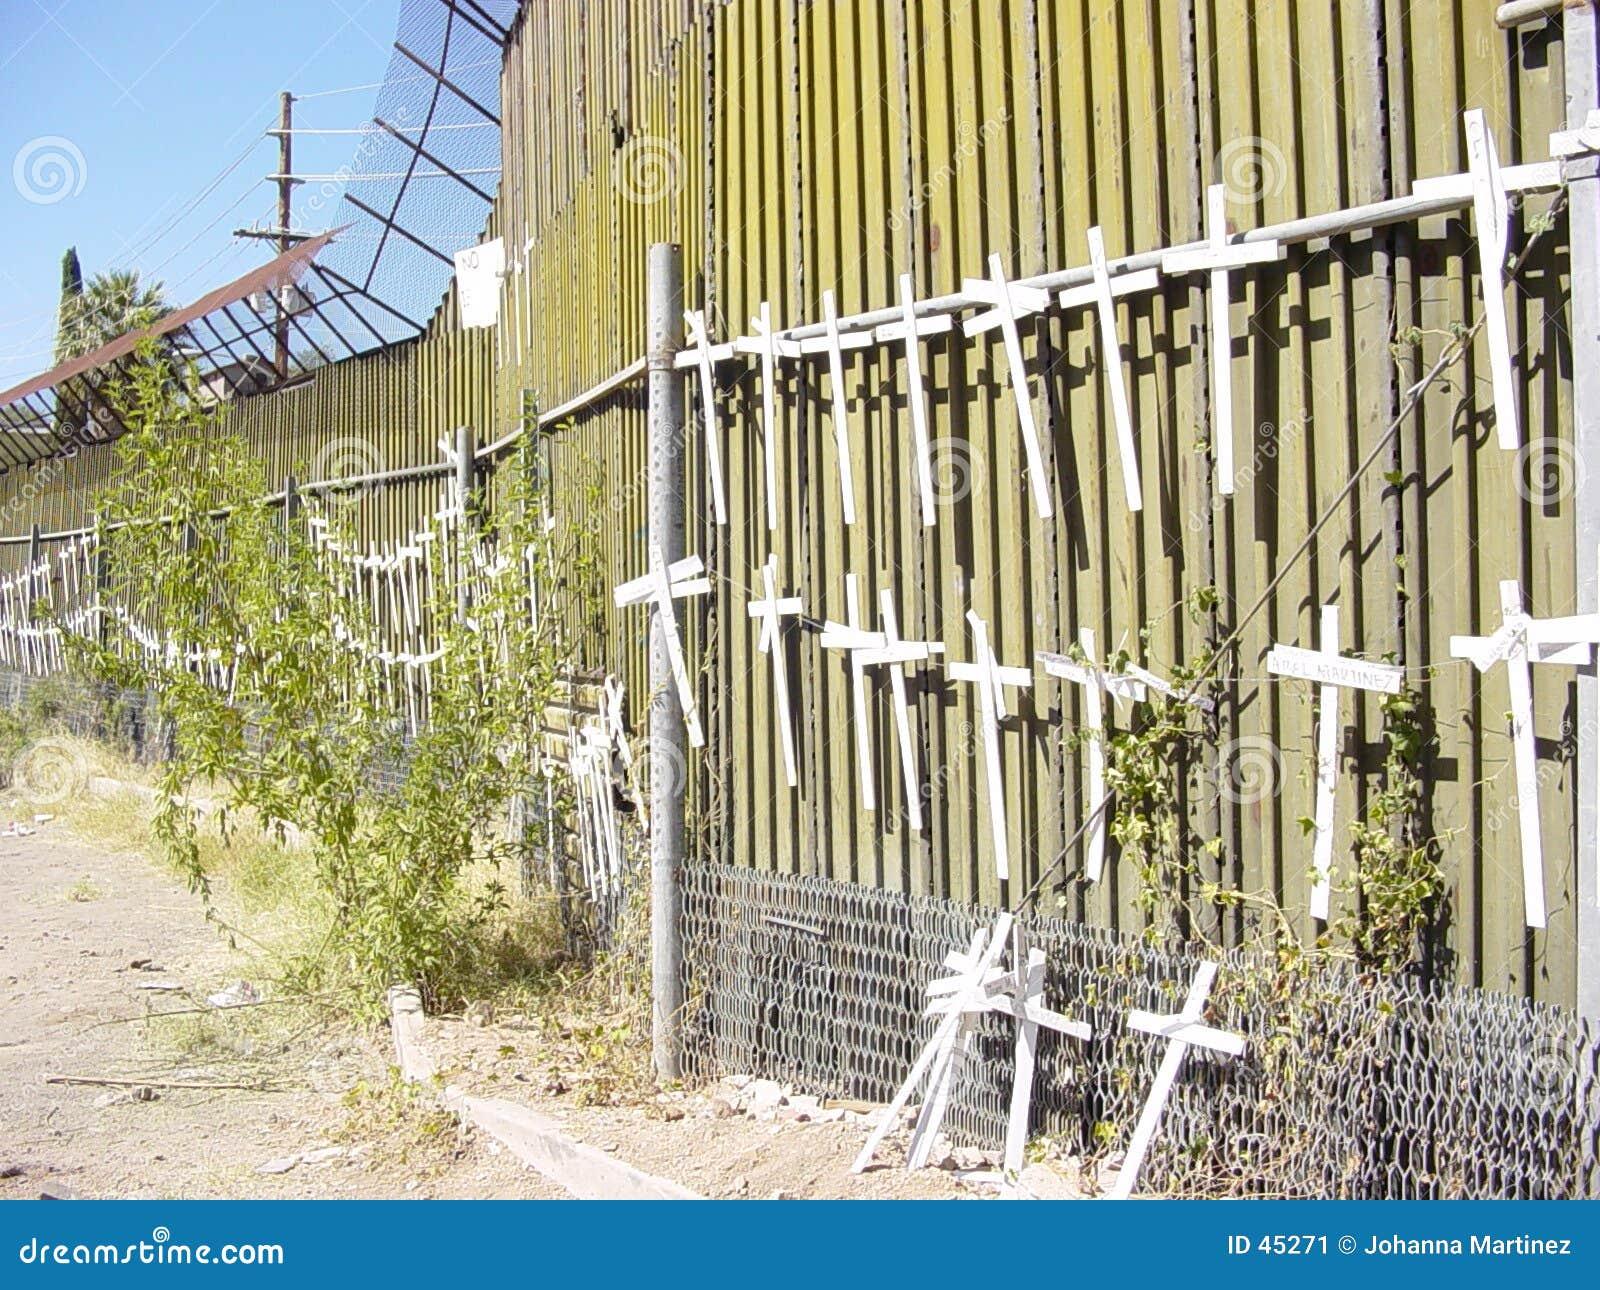 De Muur van de Grens ons-Mexico